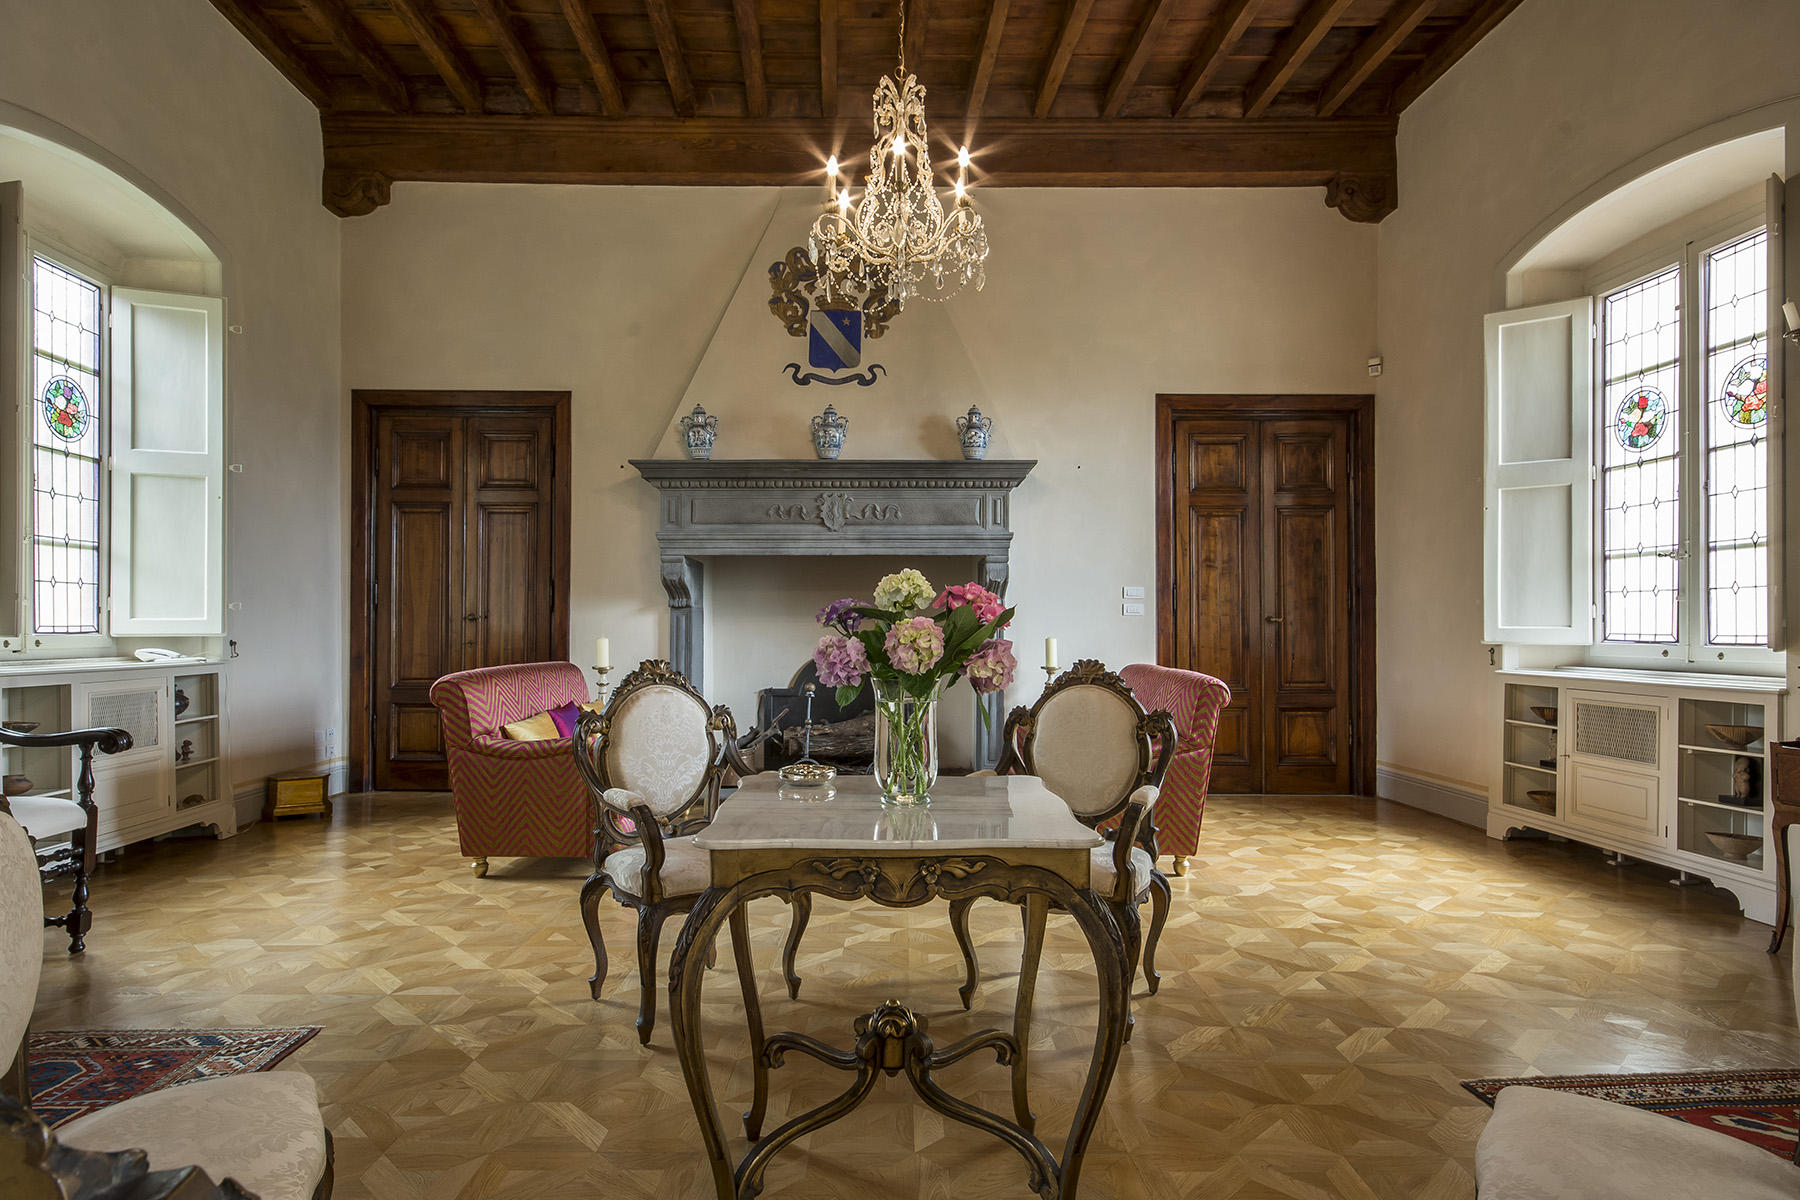 Villa in Vendita a Lucca: 5 locali, 1200 mq - Foto 8